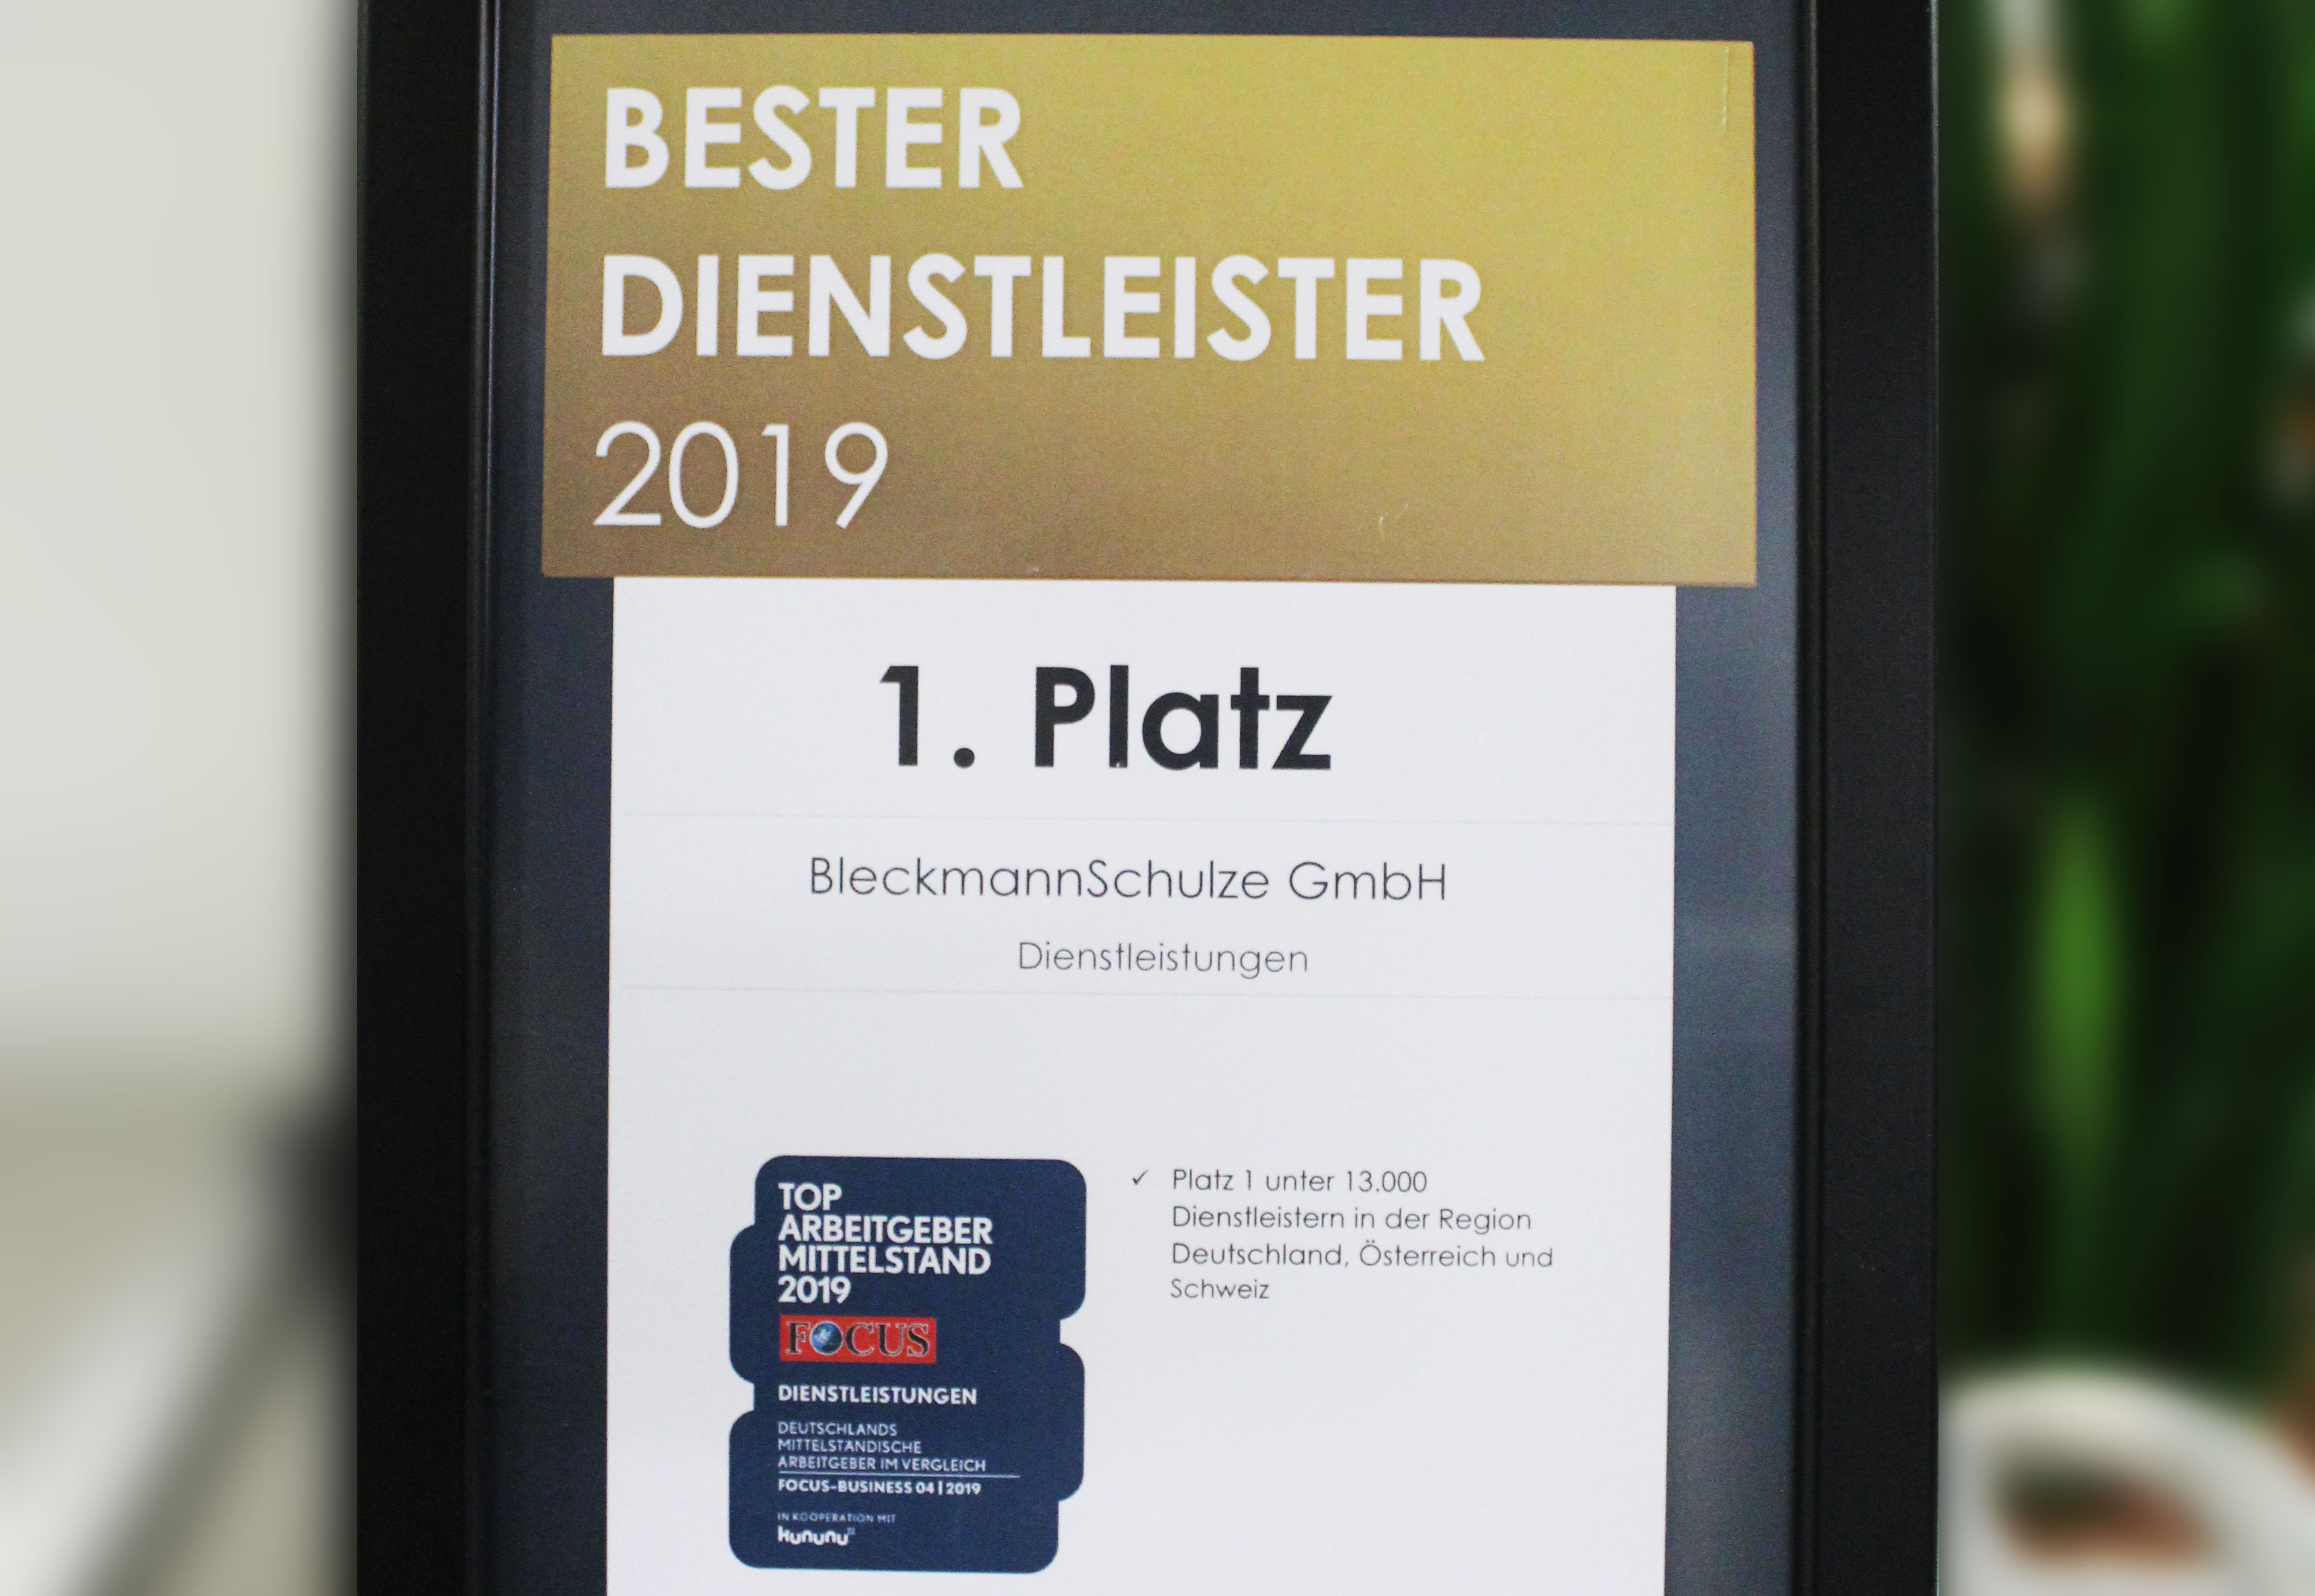 Bester Dientstleister 2019 ist BleckmannSchulze aus Köln